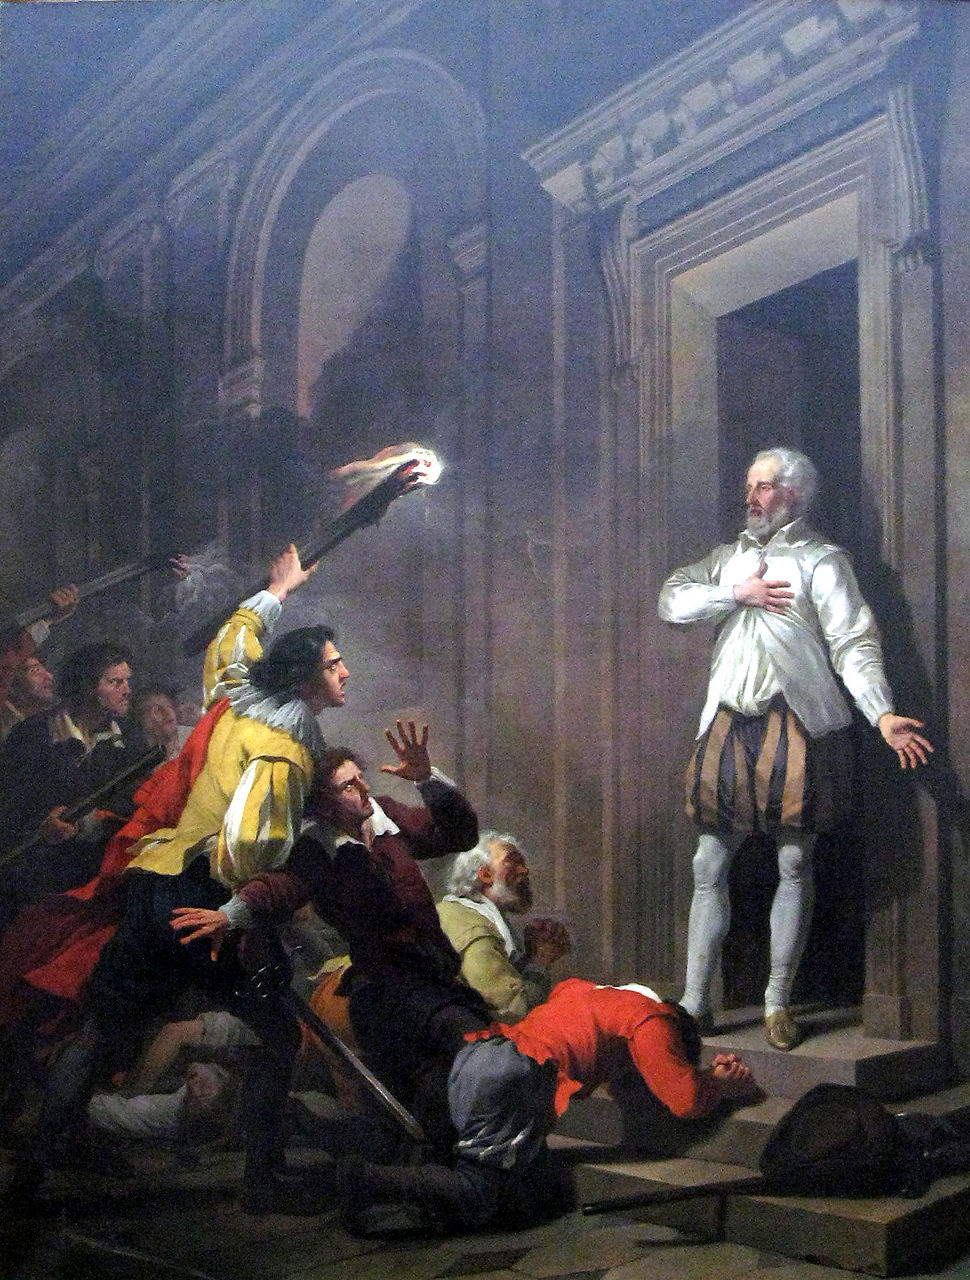 Joseph-Benoît Suvée - Admiral de Coligny impressing his murderers